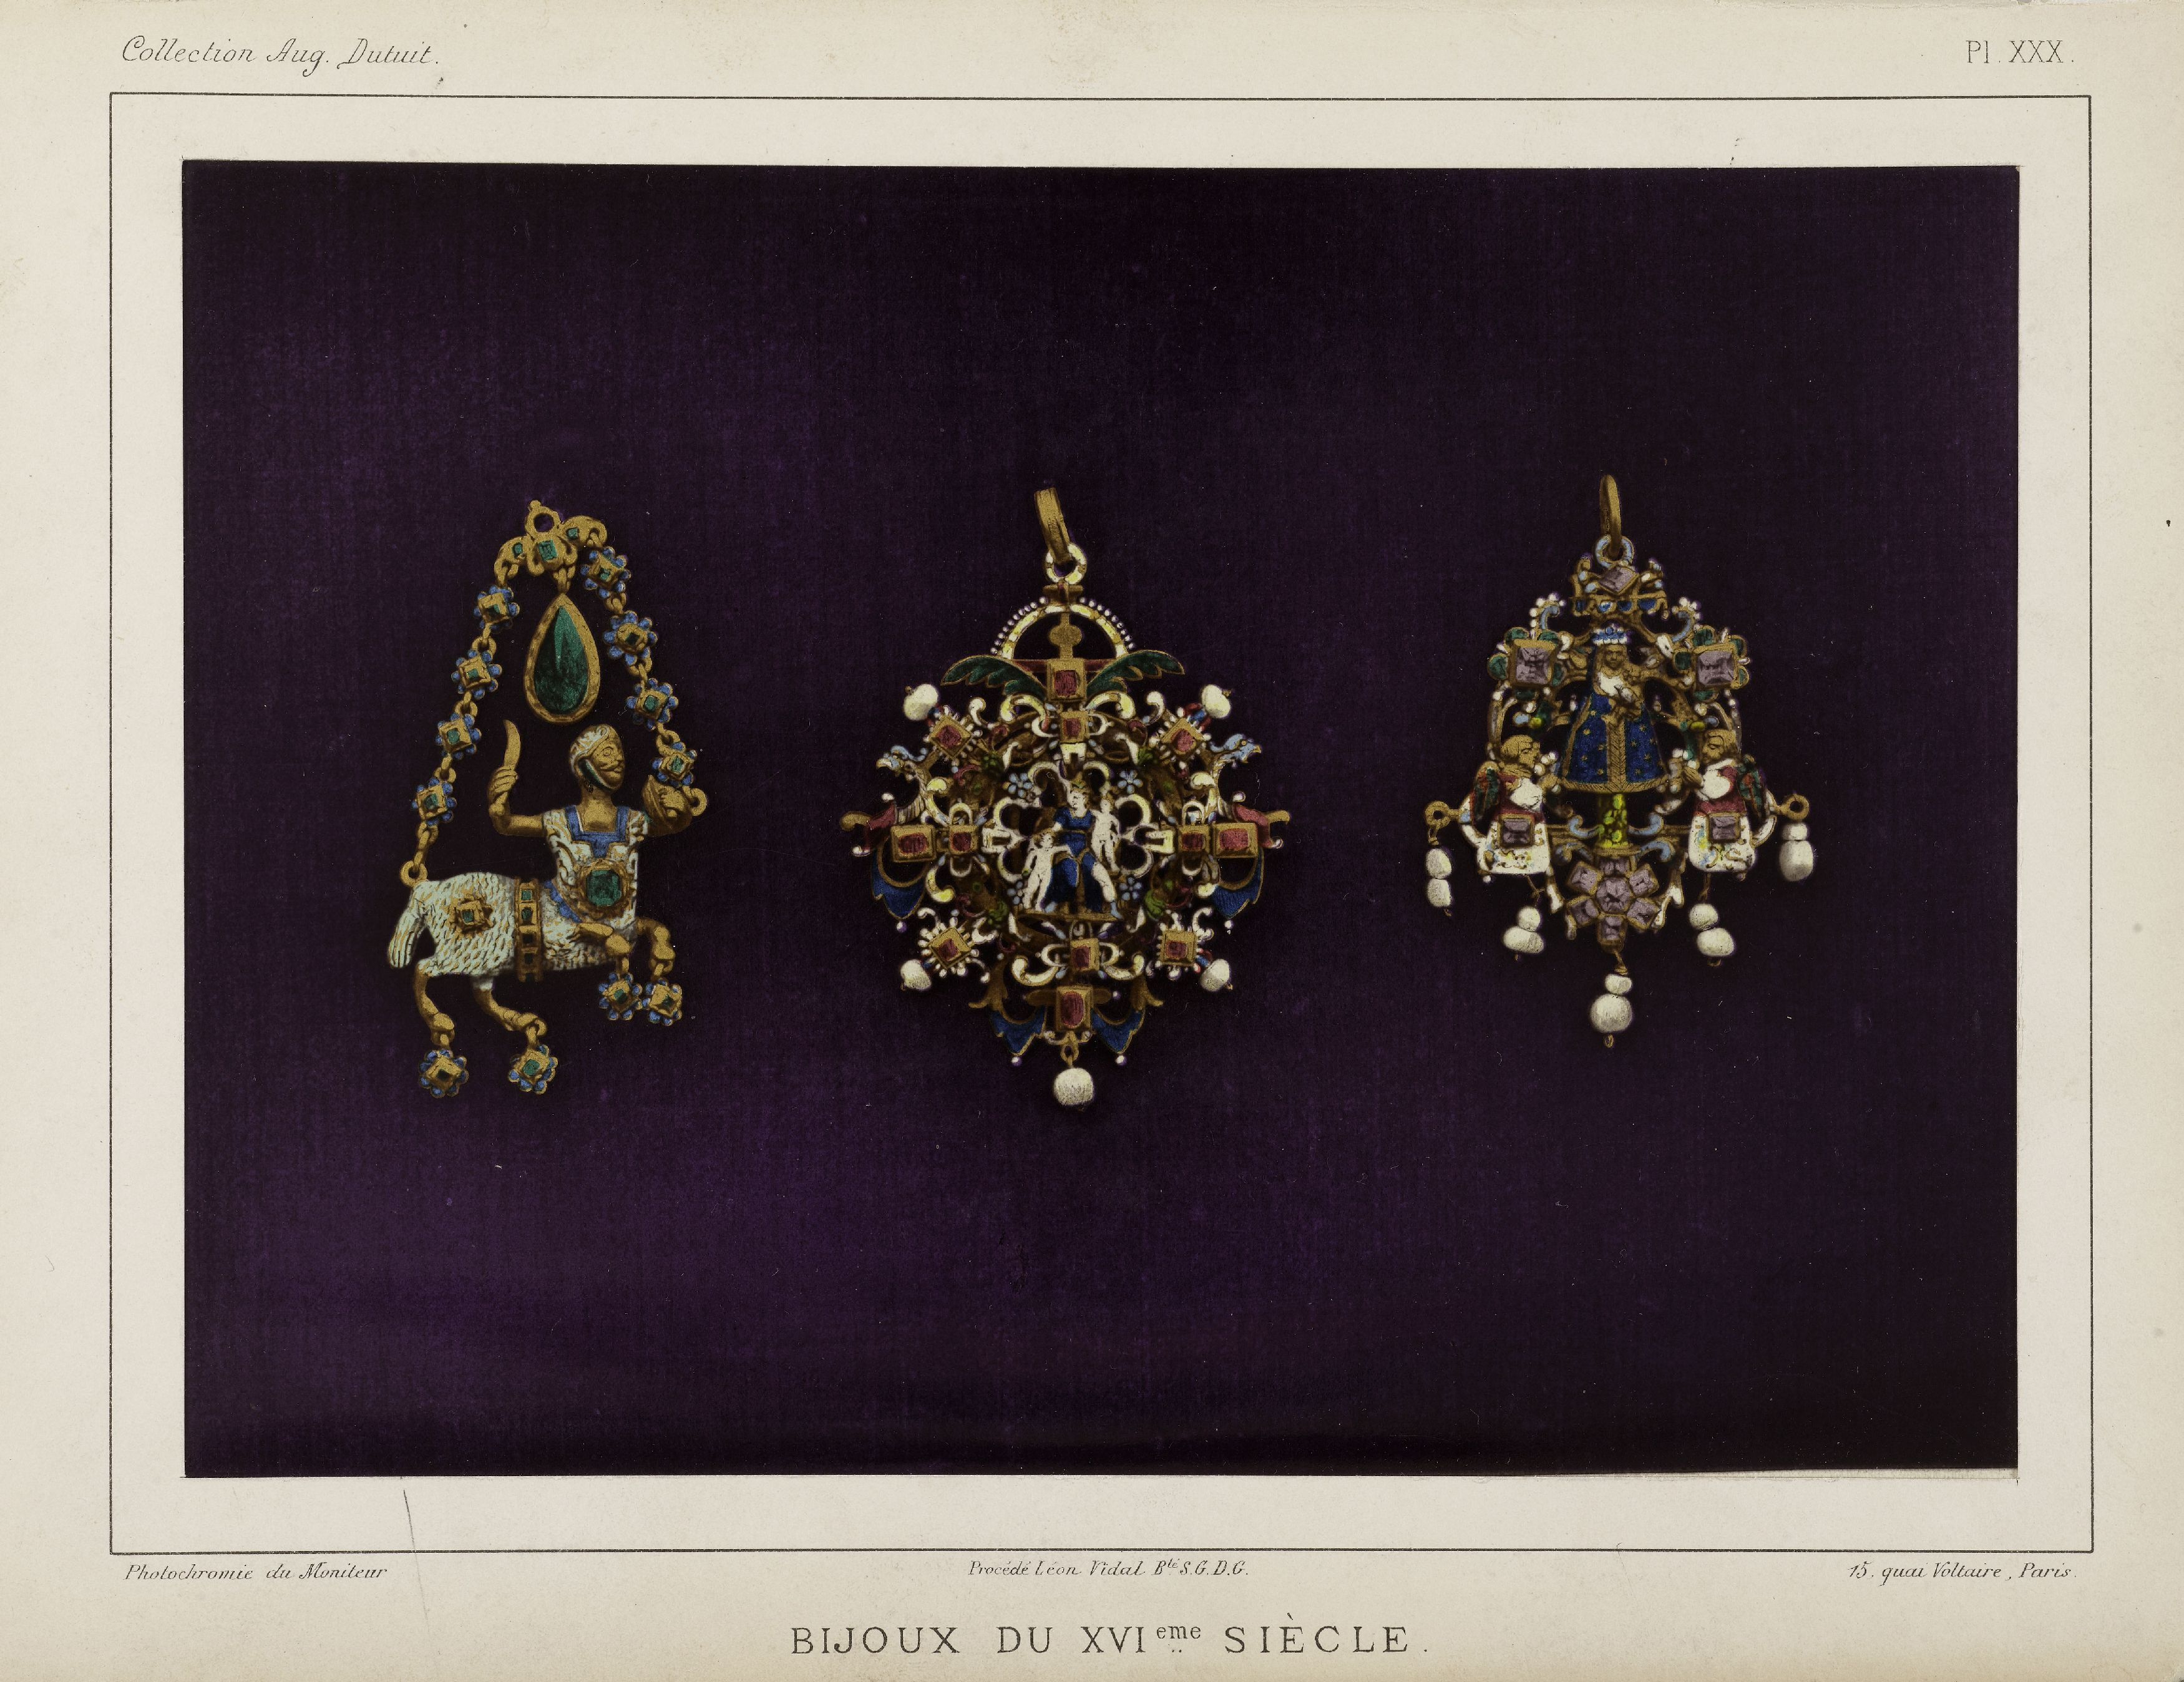 Bijoux du XVIe siècle